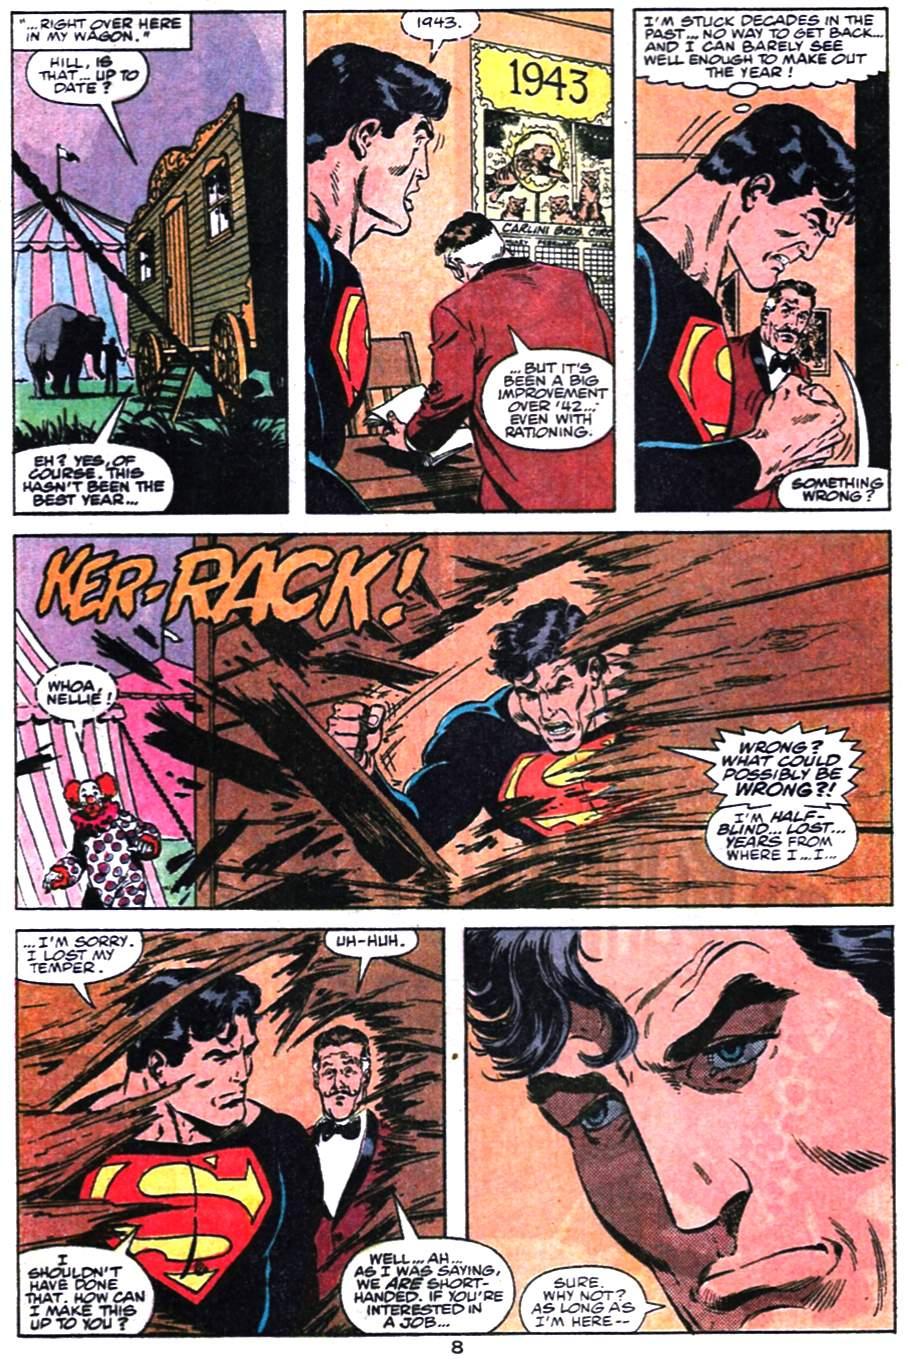 Action Comics (1938) 663 Page 8